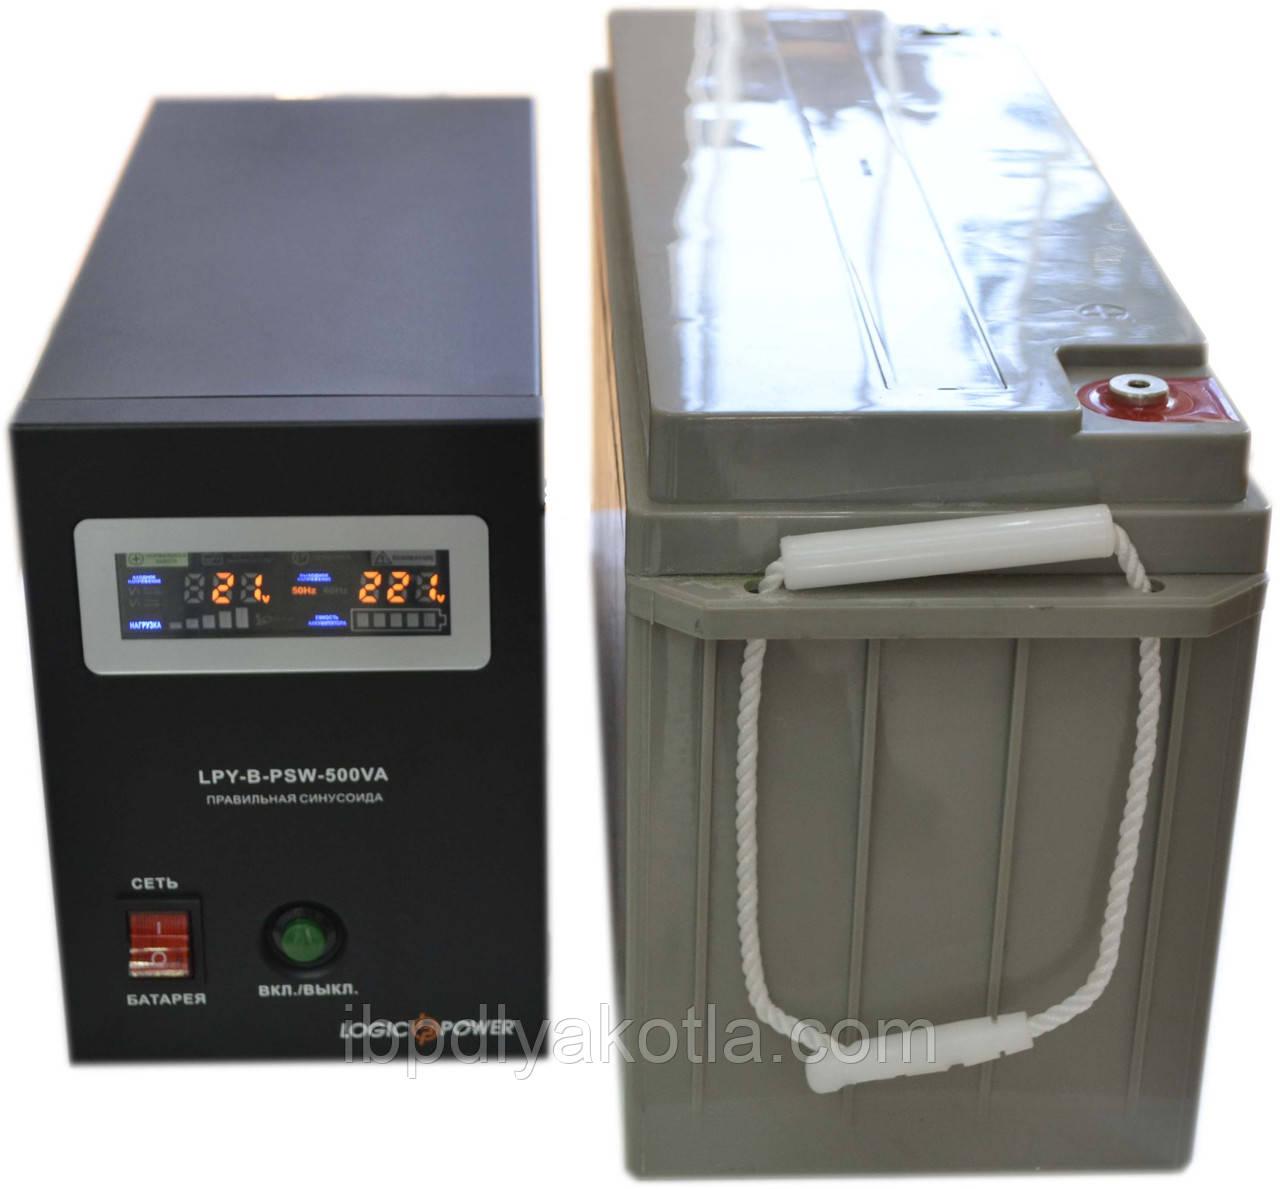 Комплект резервного питания ИБП Logicpower LPY-B-PSW-500 + АКБ LP-MG150 для 15-20ч работы газового котла